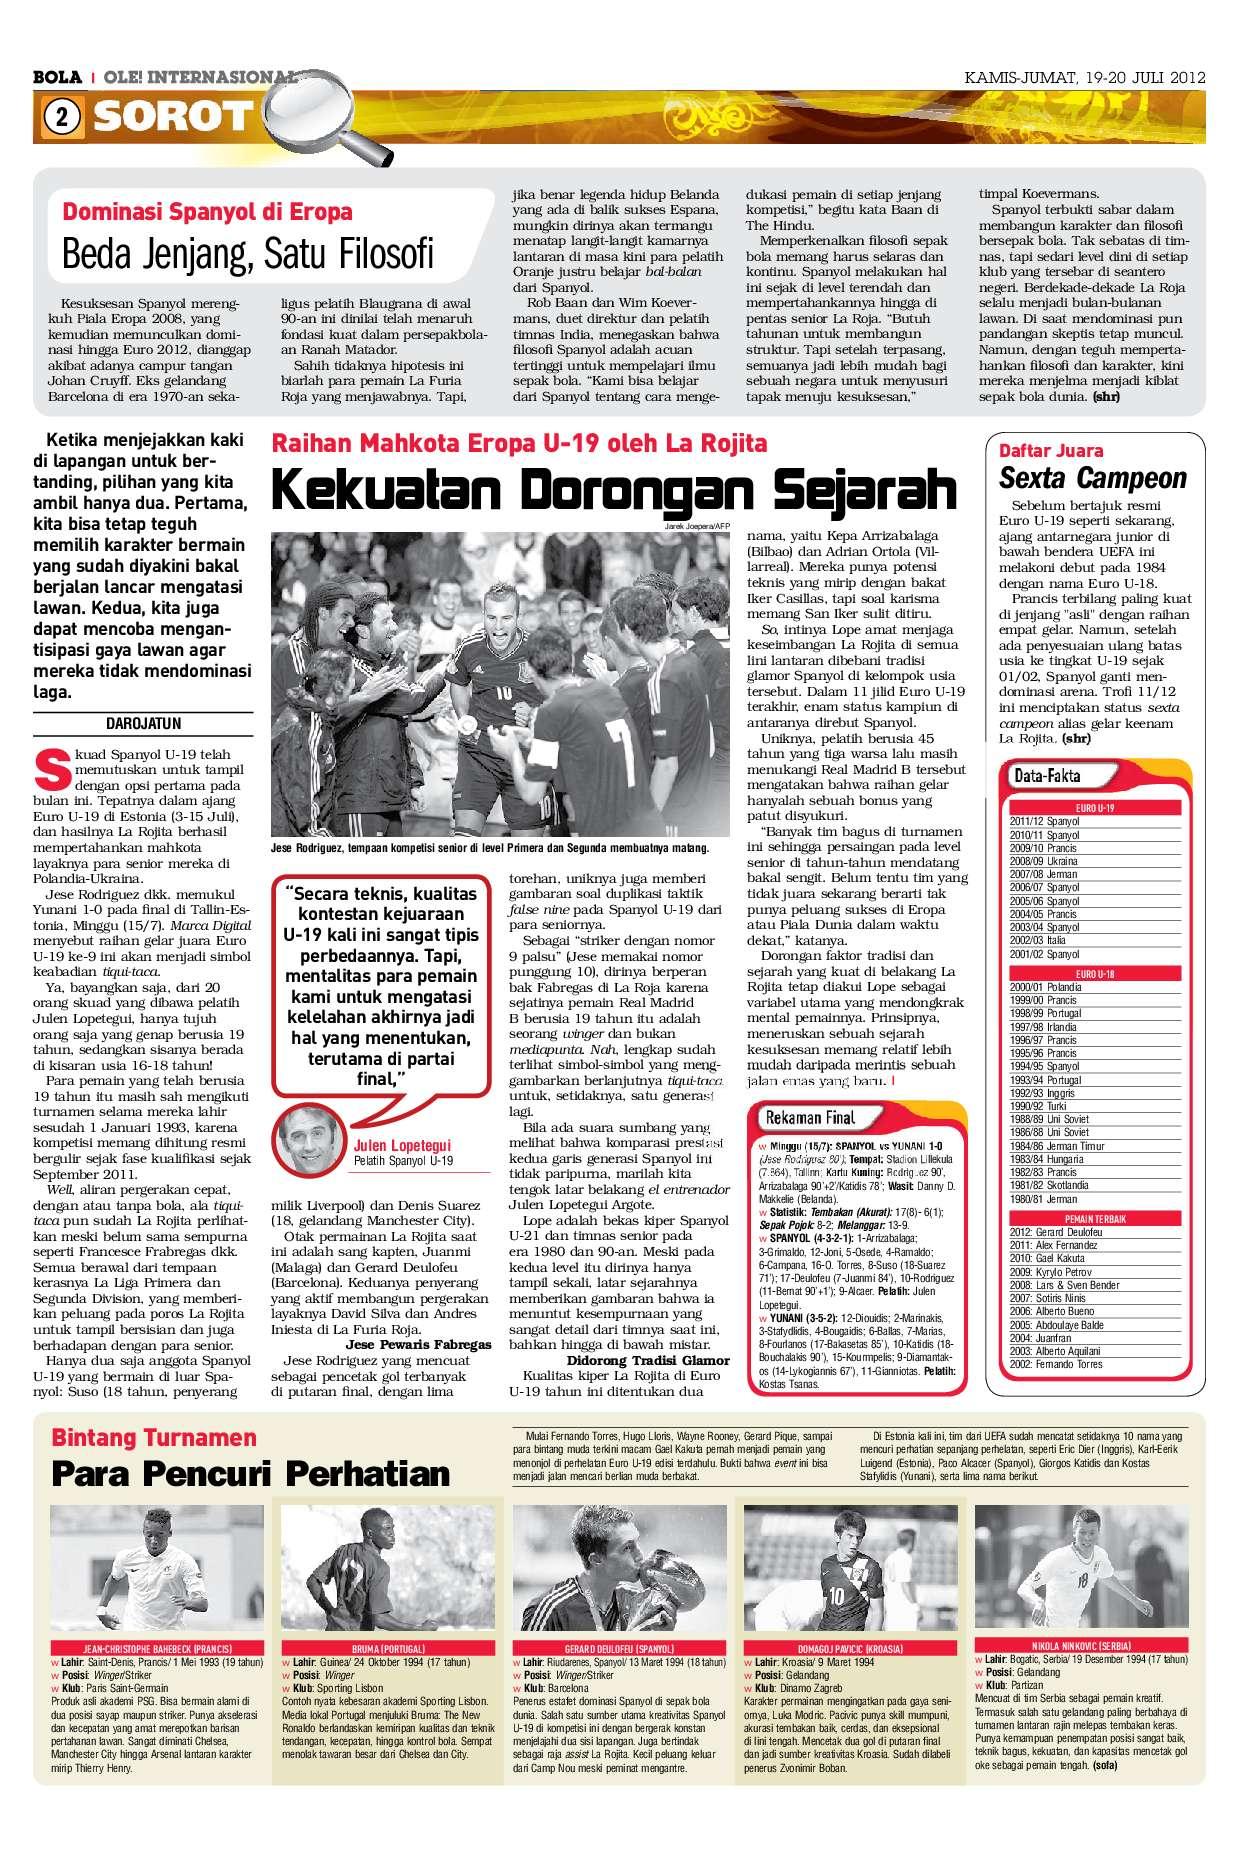 Bola Kamis Magazine Ed 2379 2012 Gramedia Digital